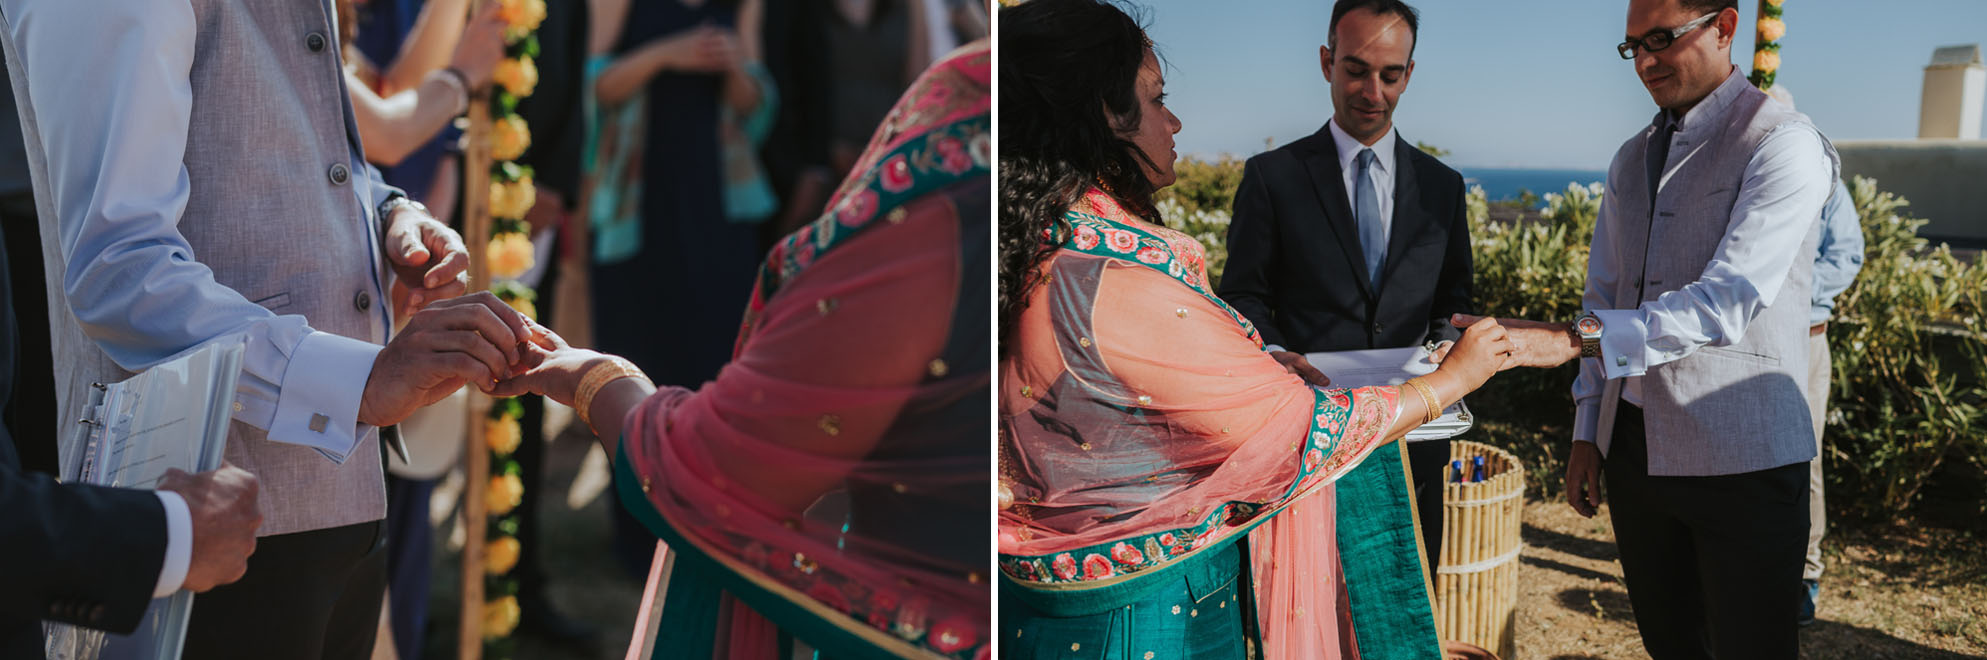 Mykonos Wedding Photographer-DMOL-6-13